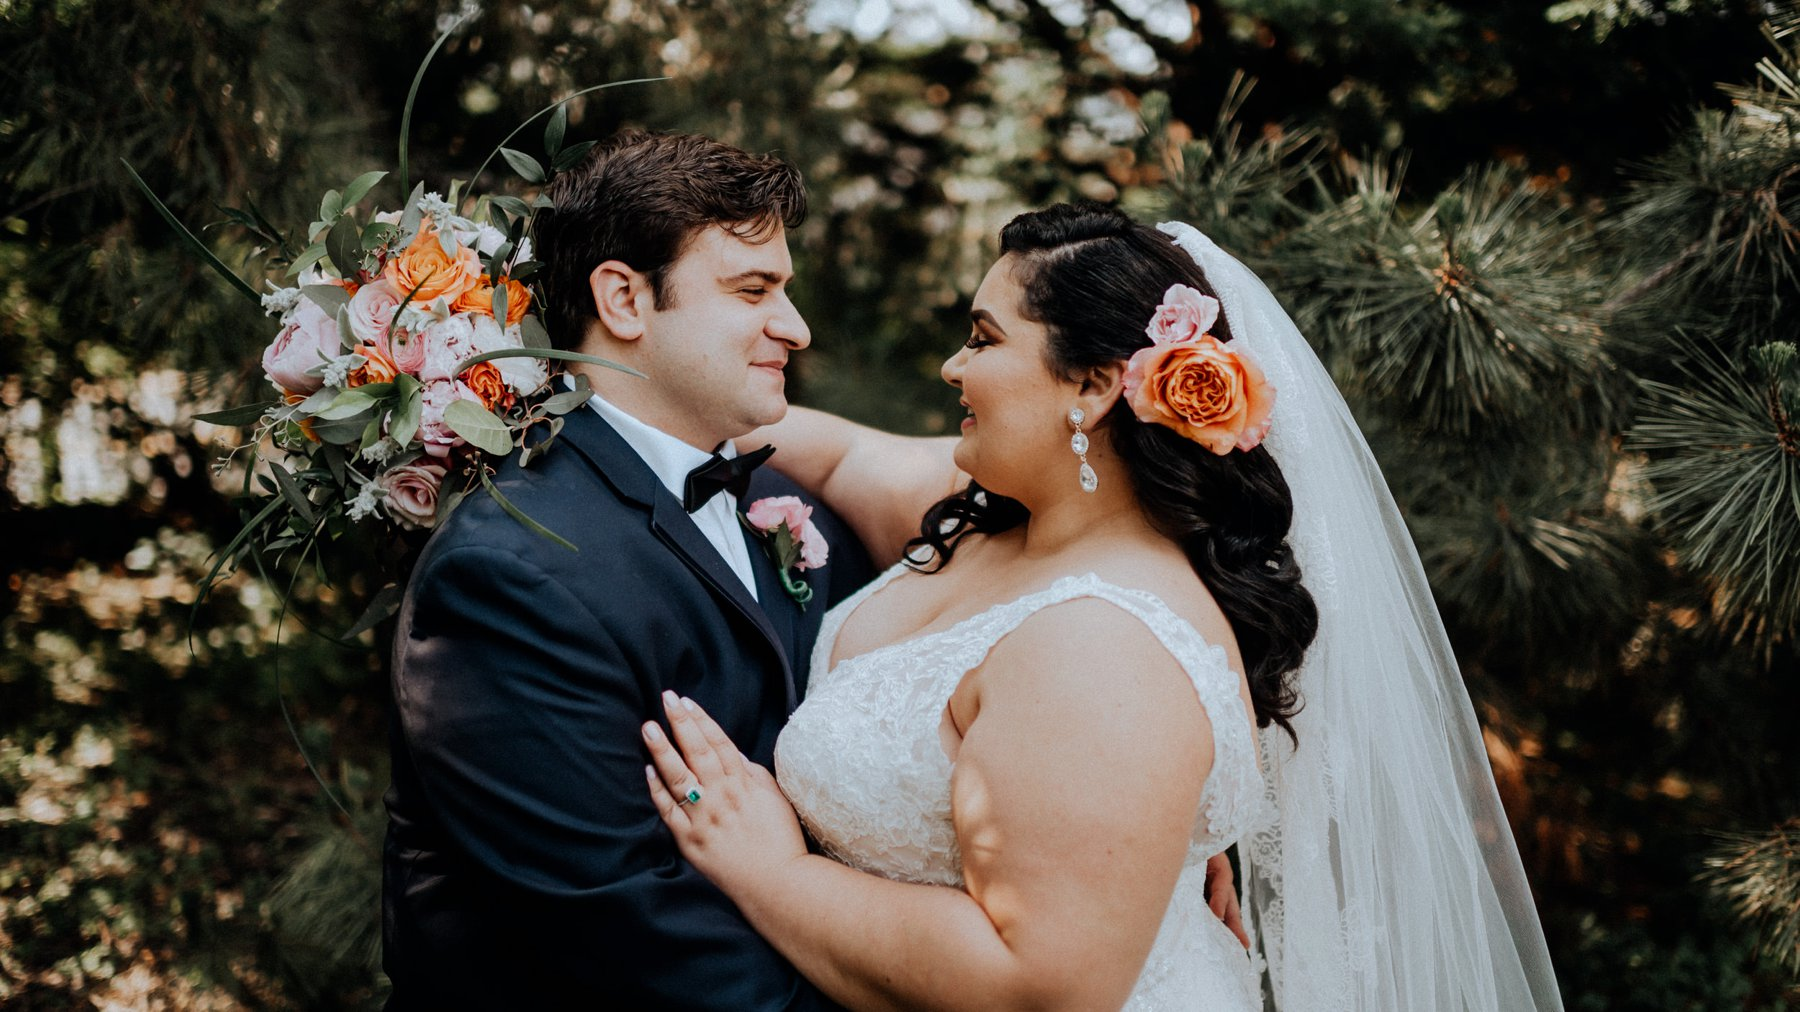 207-202-knowlton-mansion-wedding-3.jpg